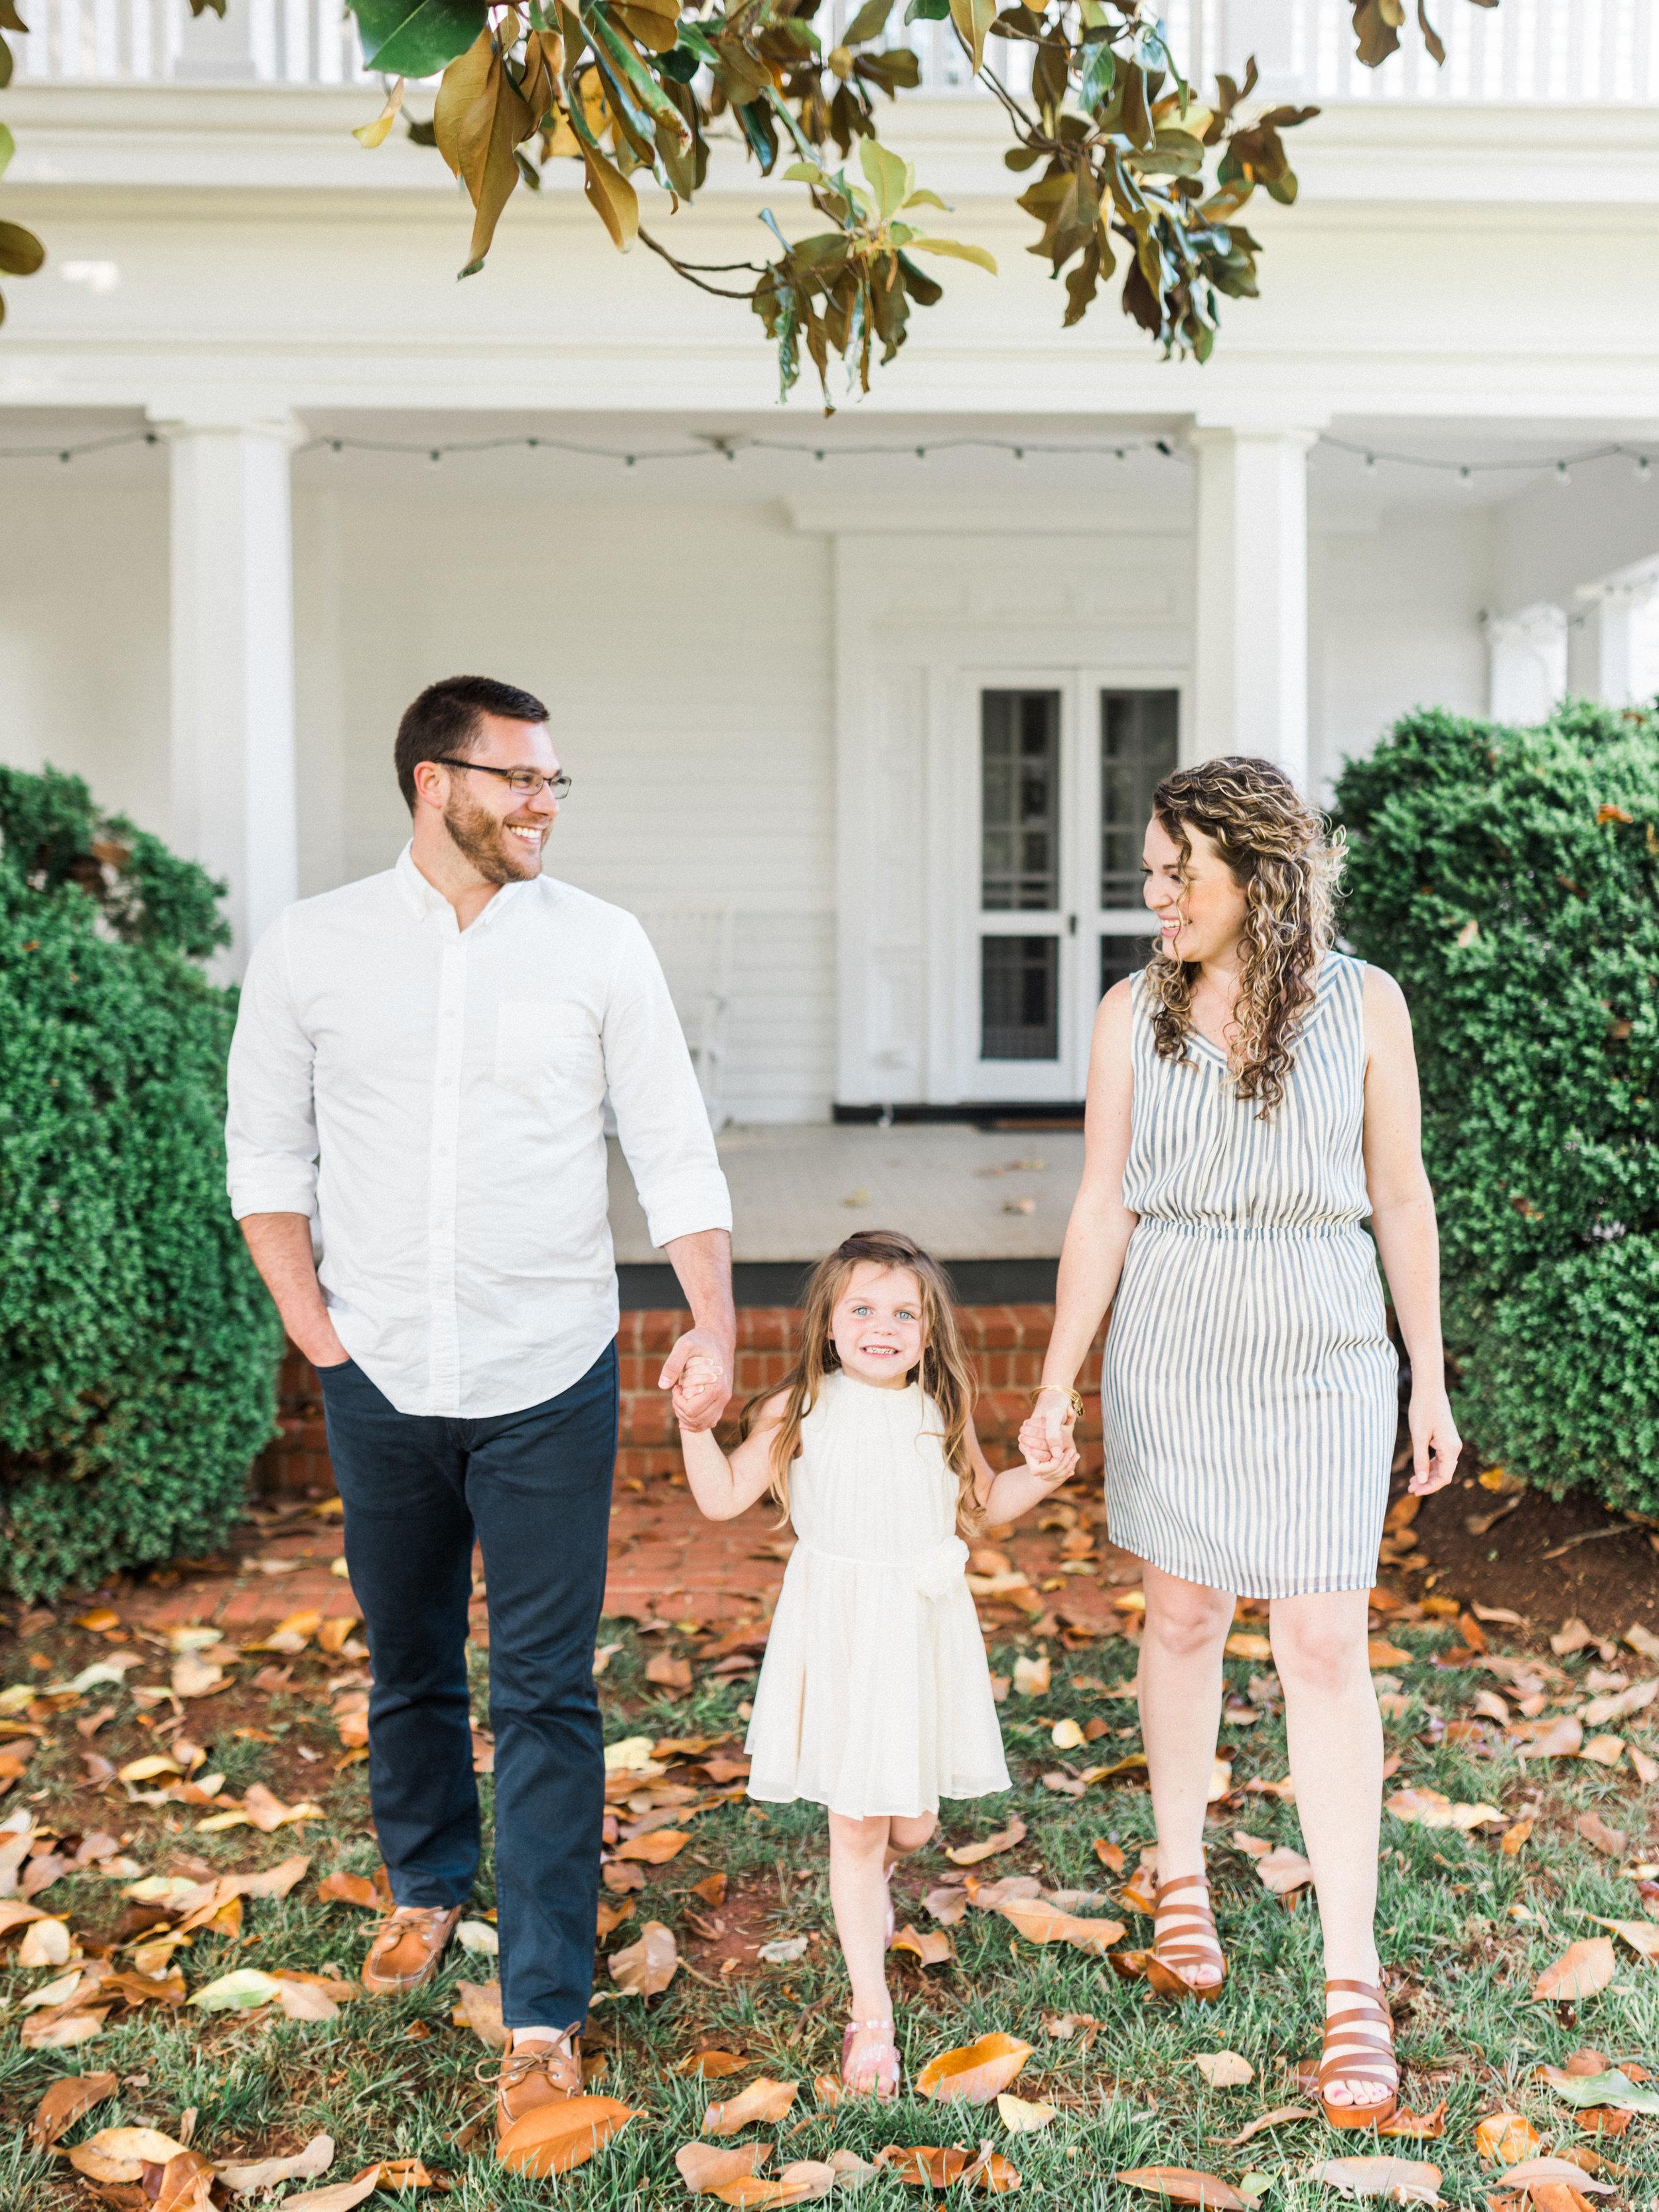 Charlottesville VA Wedding Photographer    Lynchburg Wedding Photographer    www.asheyeiban.com    Ashley Eiban Photography